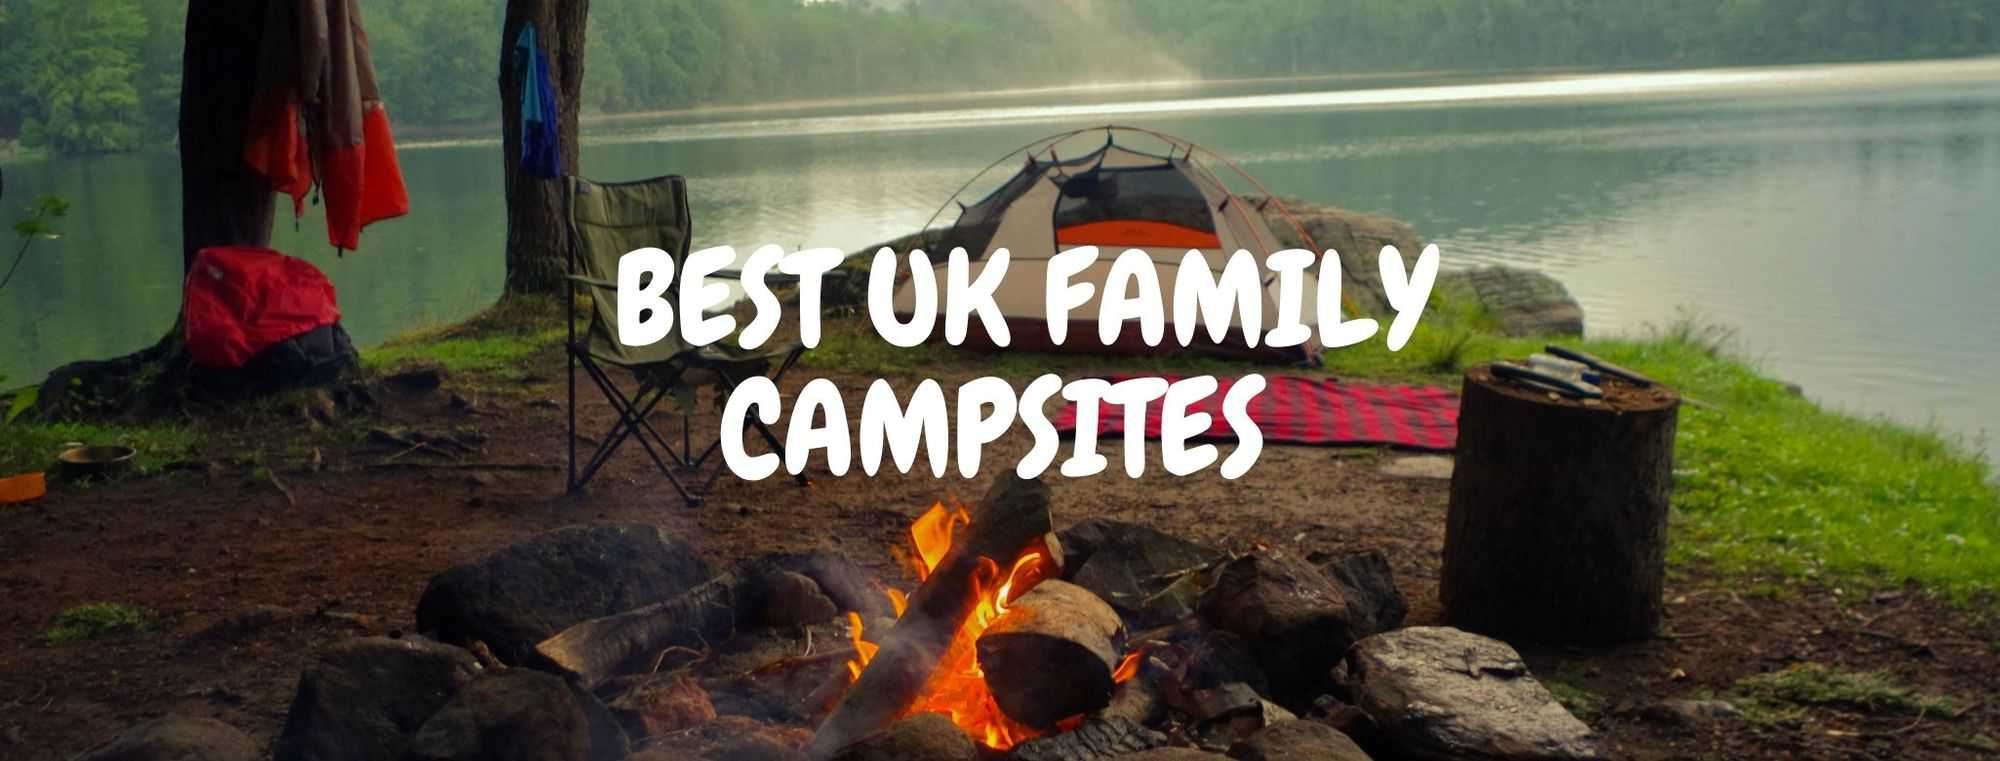 FAMILY CAMPING UK